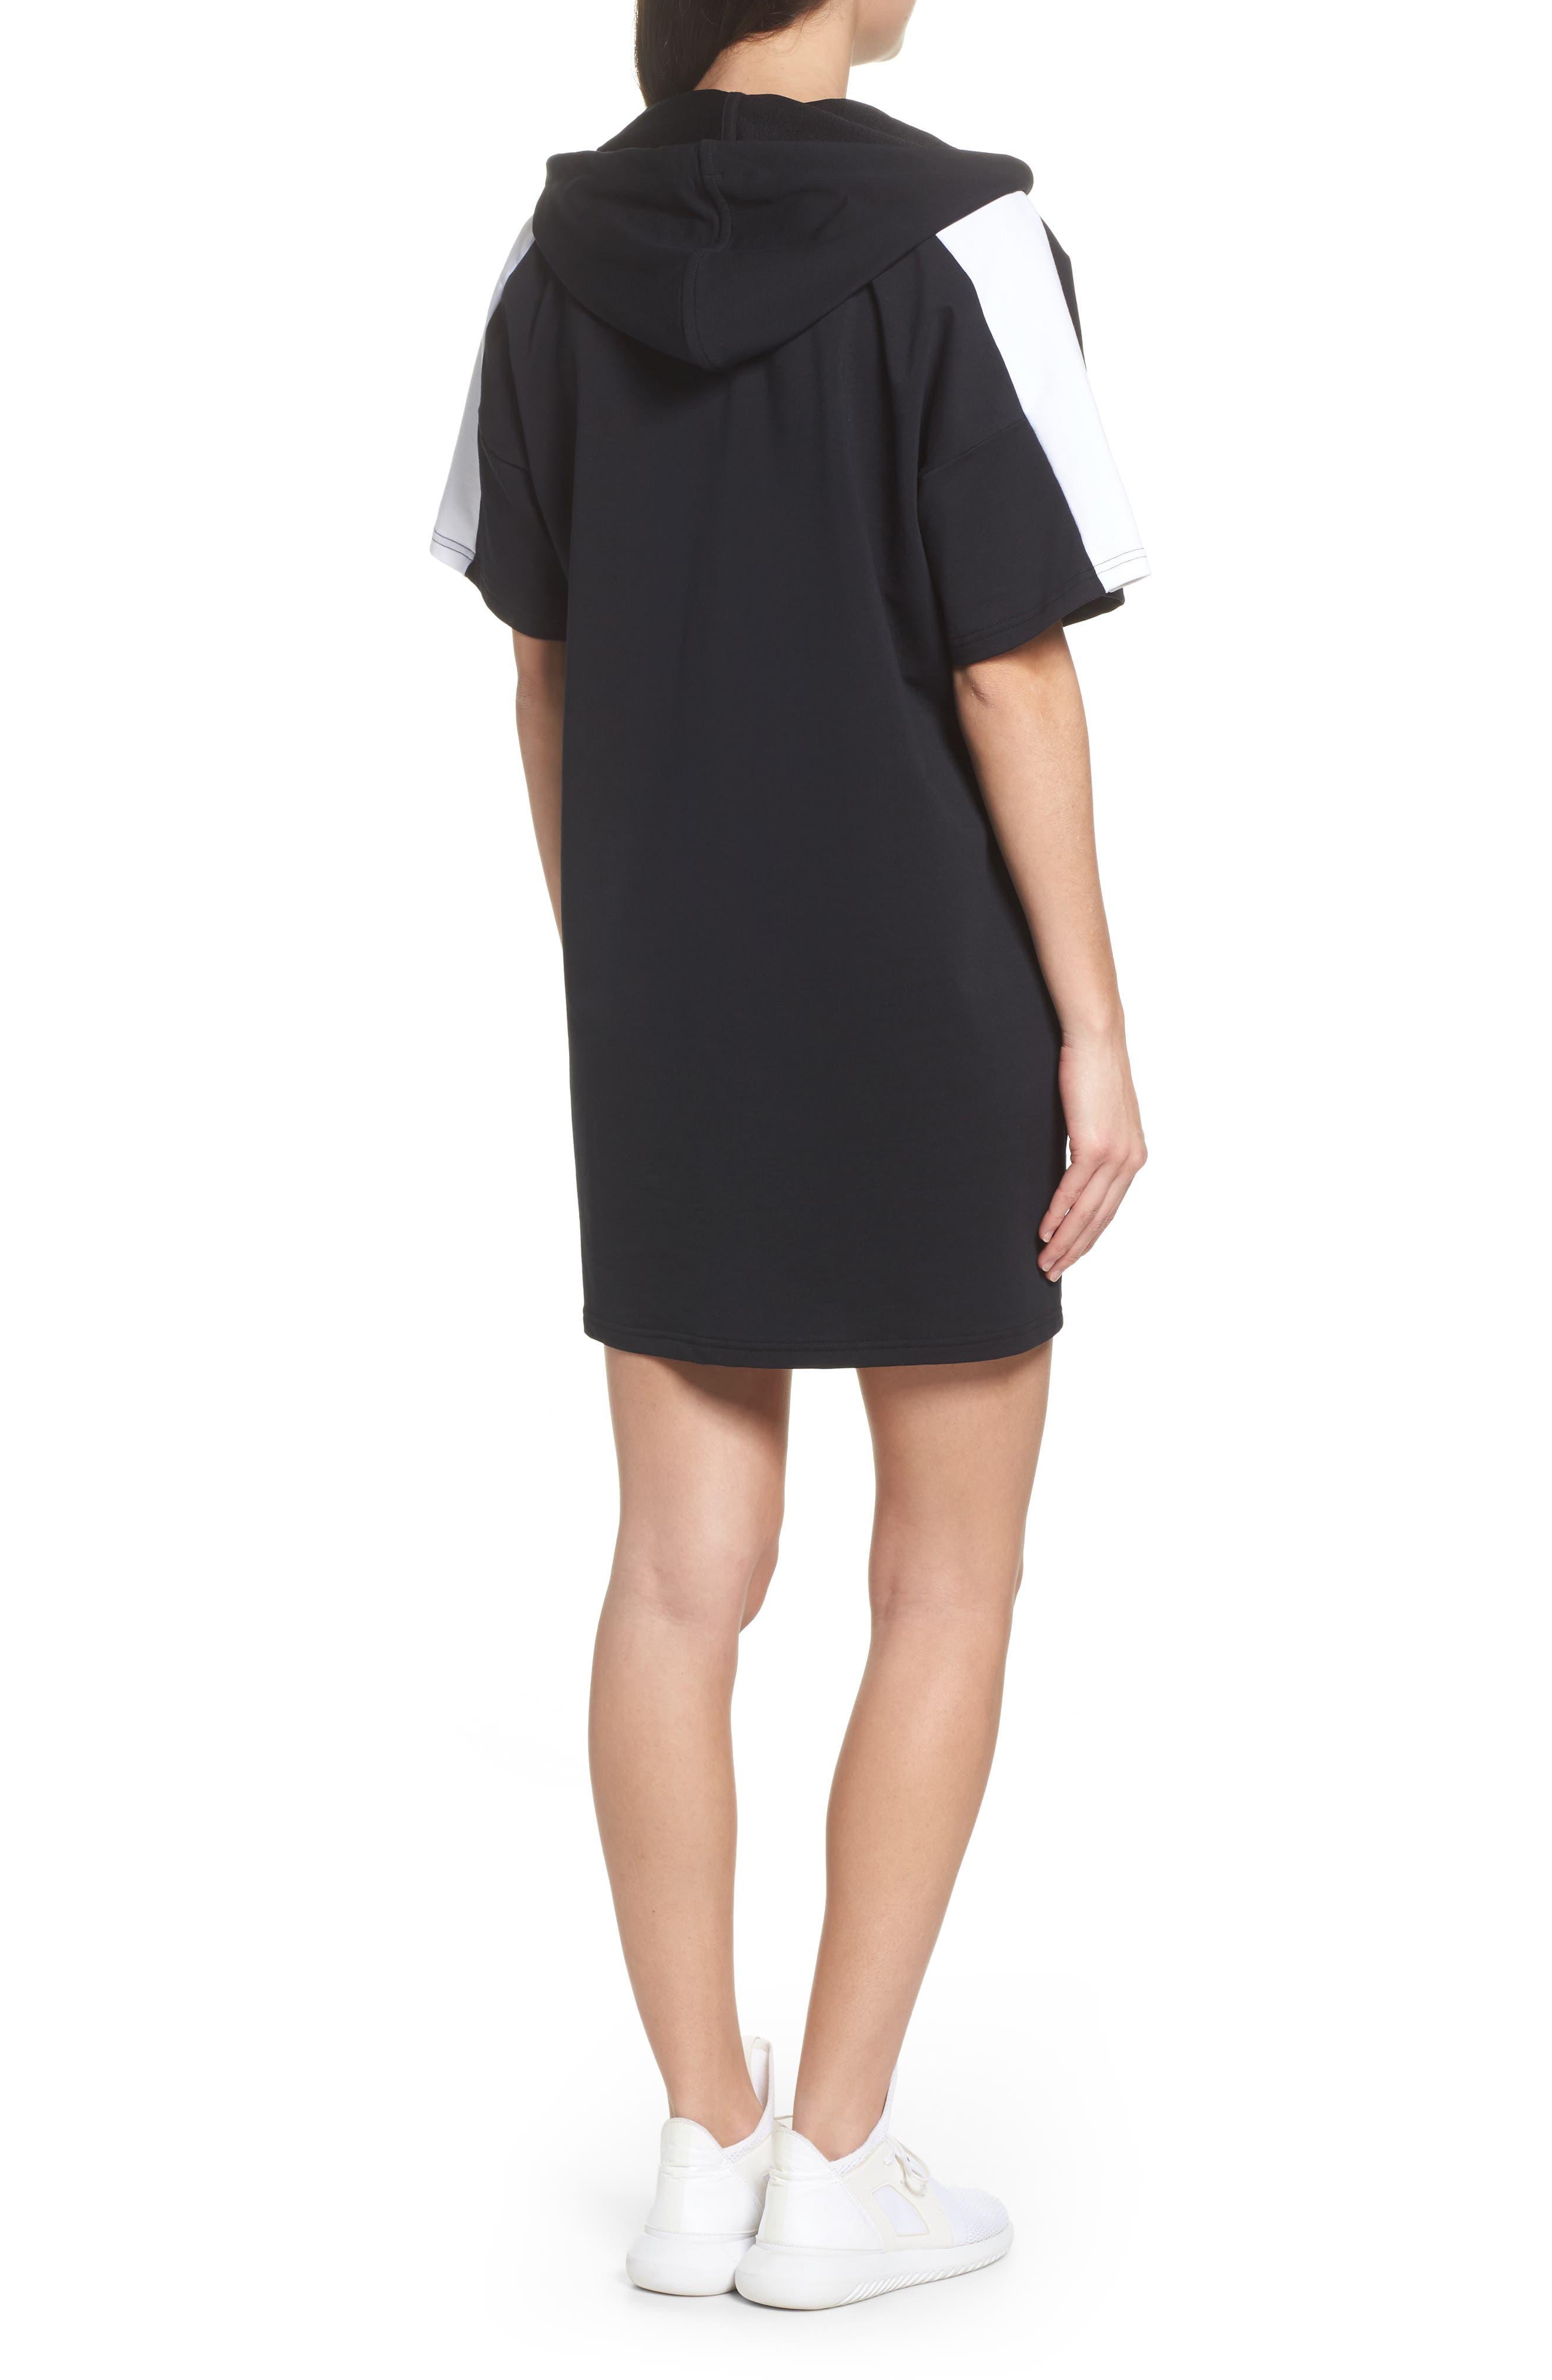 Archive Dress,                             Alternate thumbnail 2, color,                             Puma Black